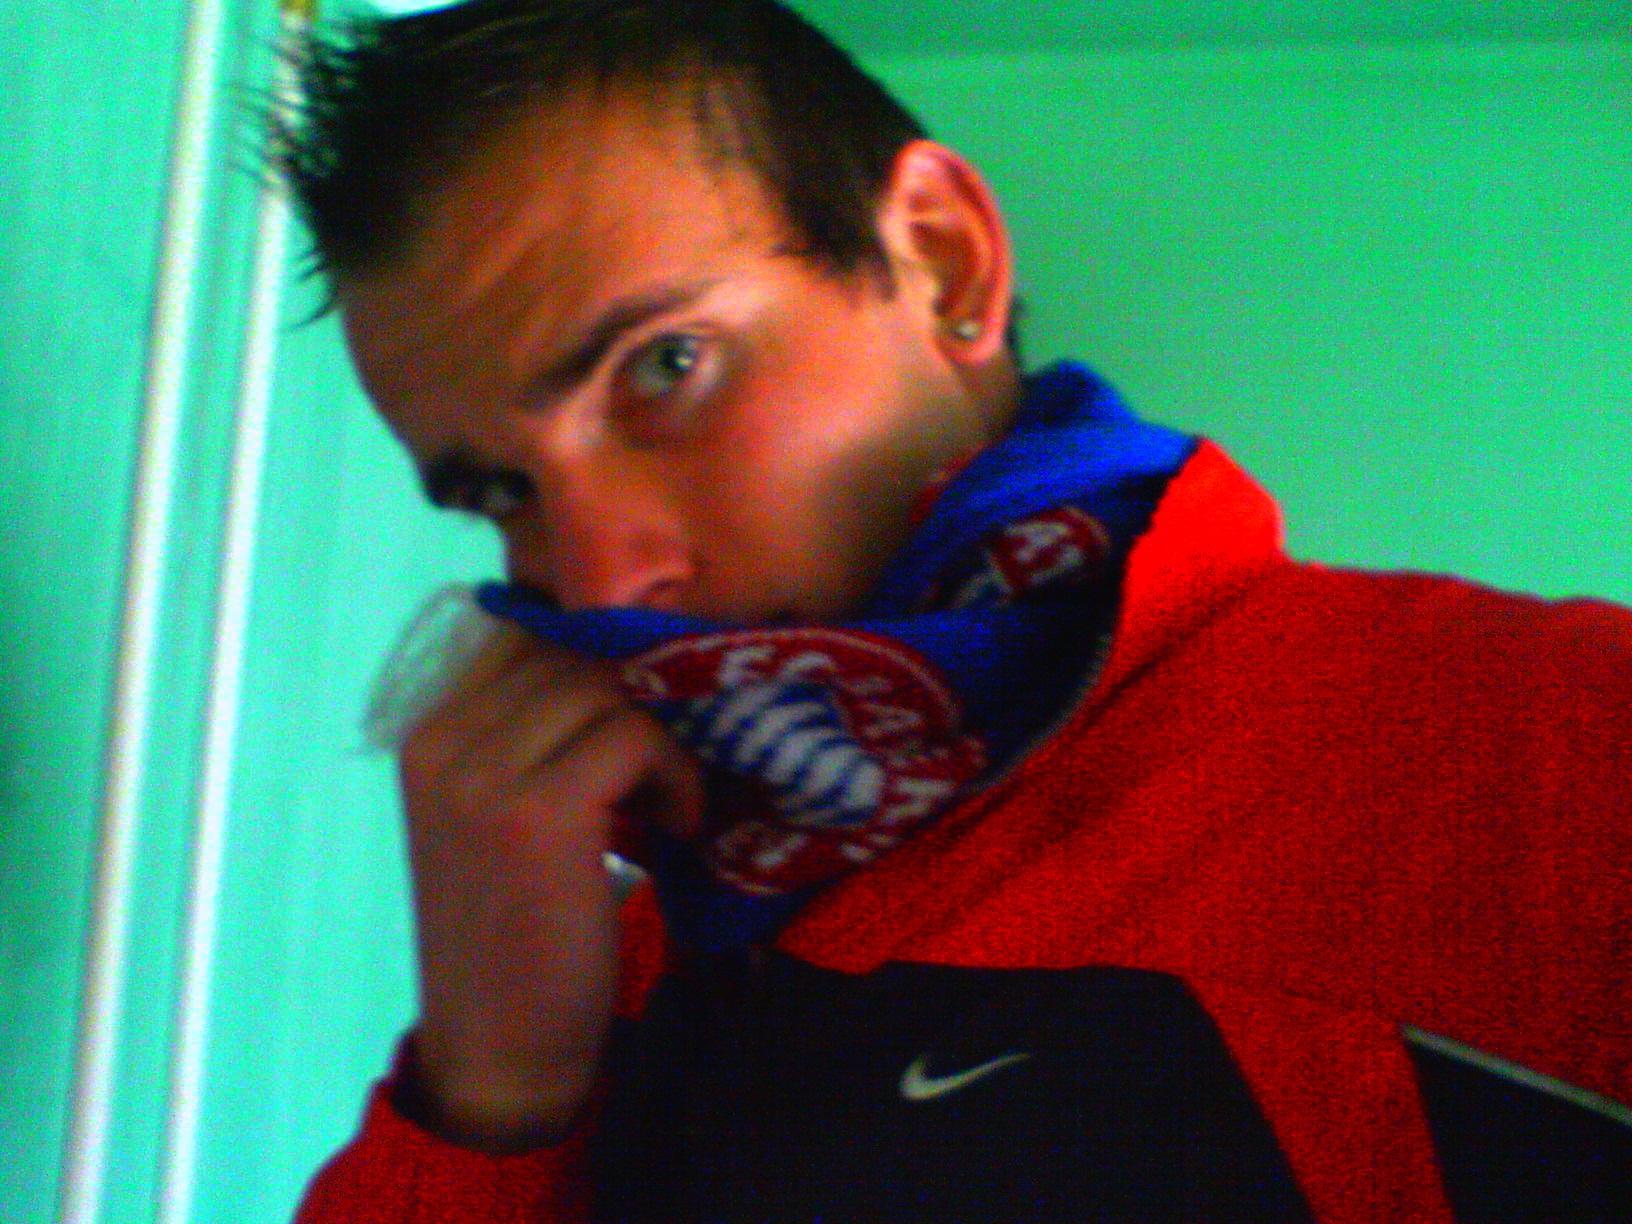 Pálinkás Zoltán, 34